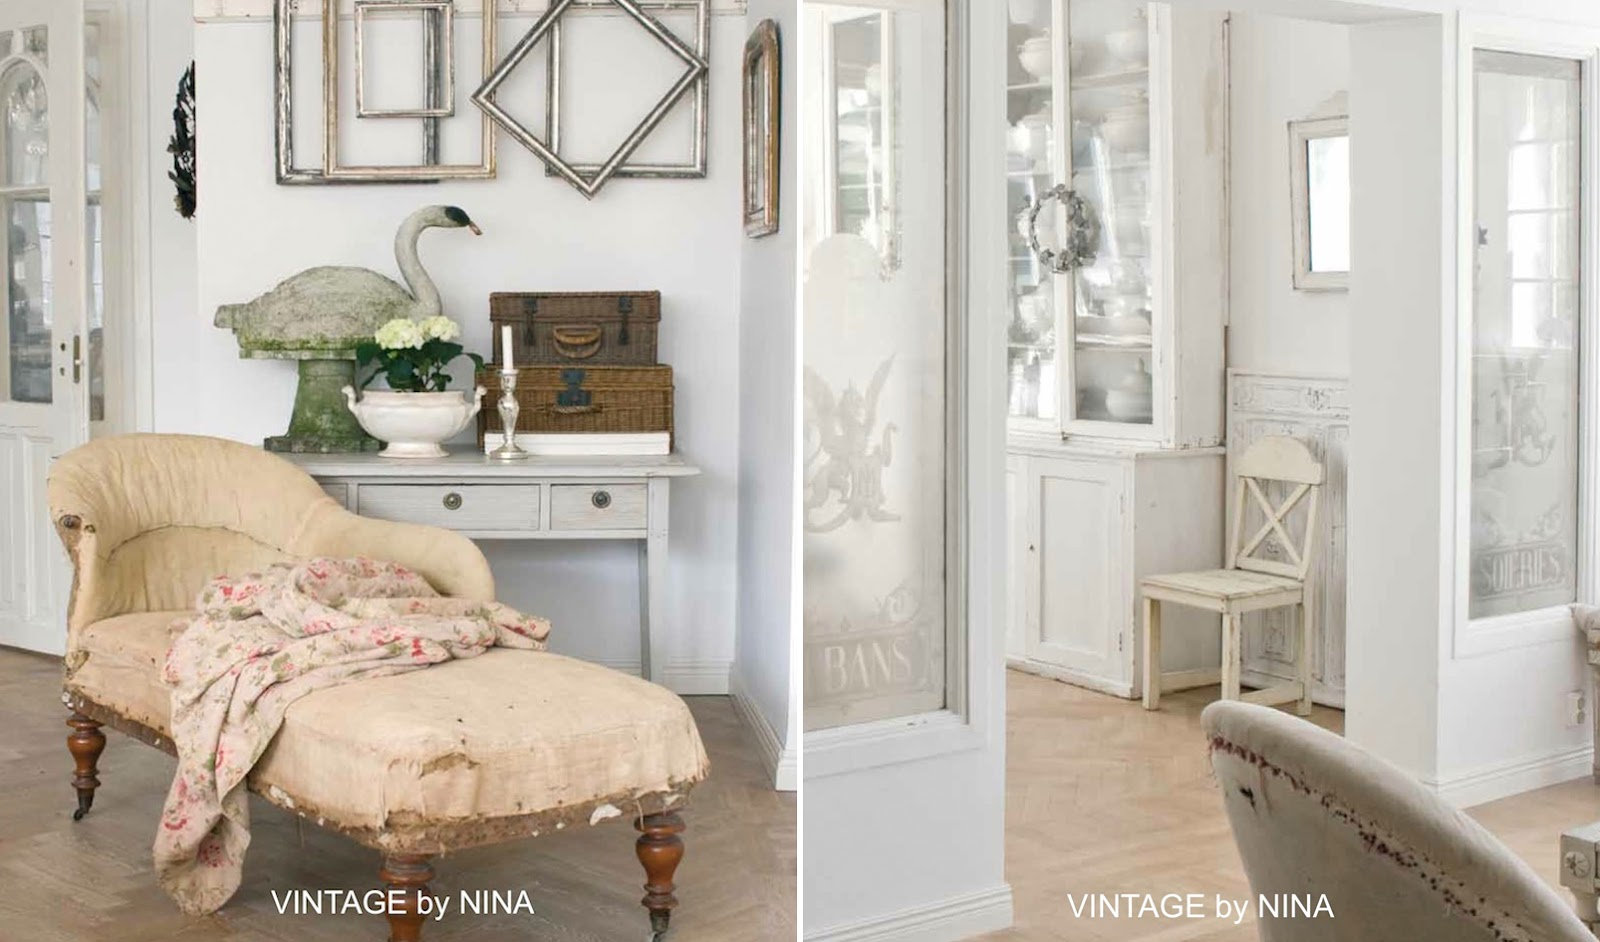 Ispirazione vintage shabby chic interiors - Shabby chic interiors bagno ...